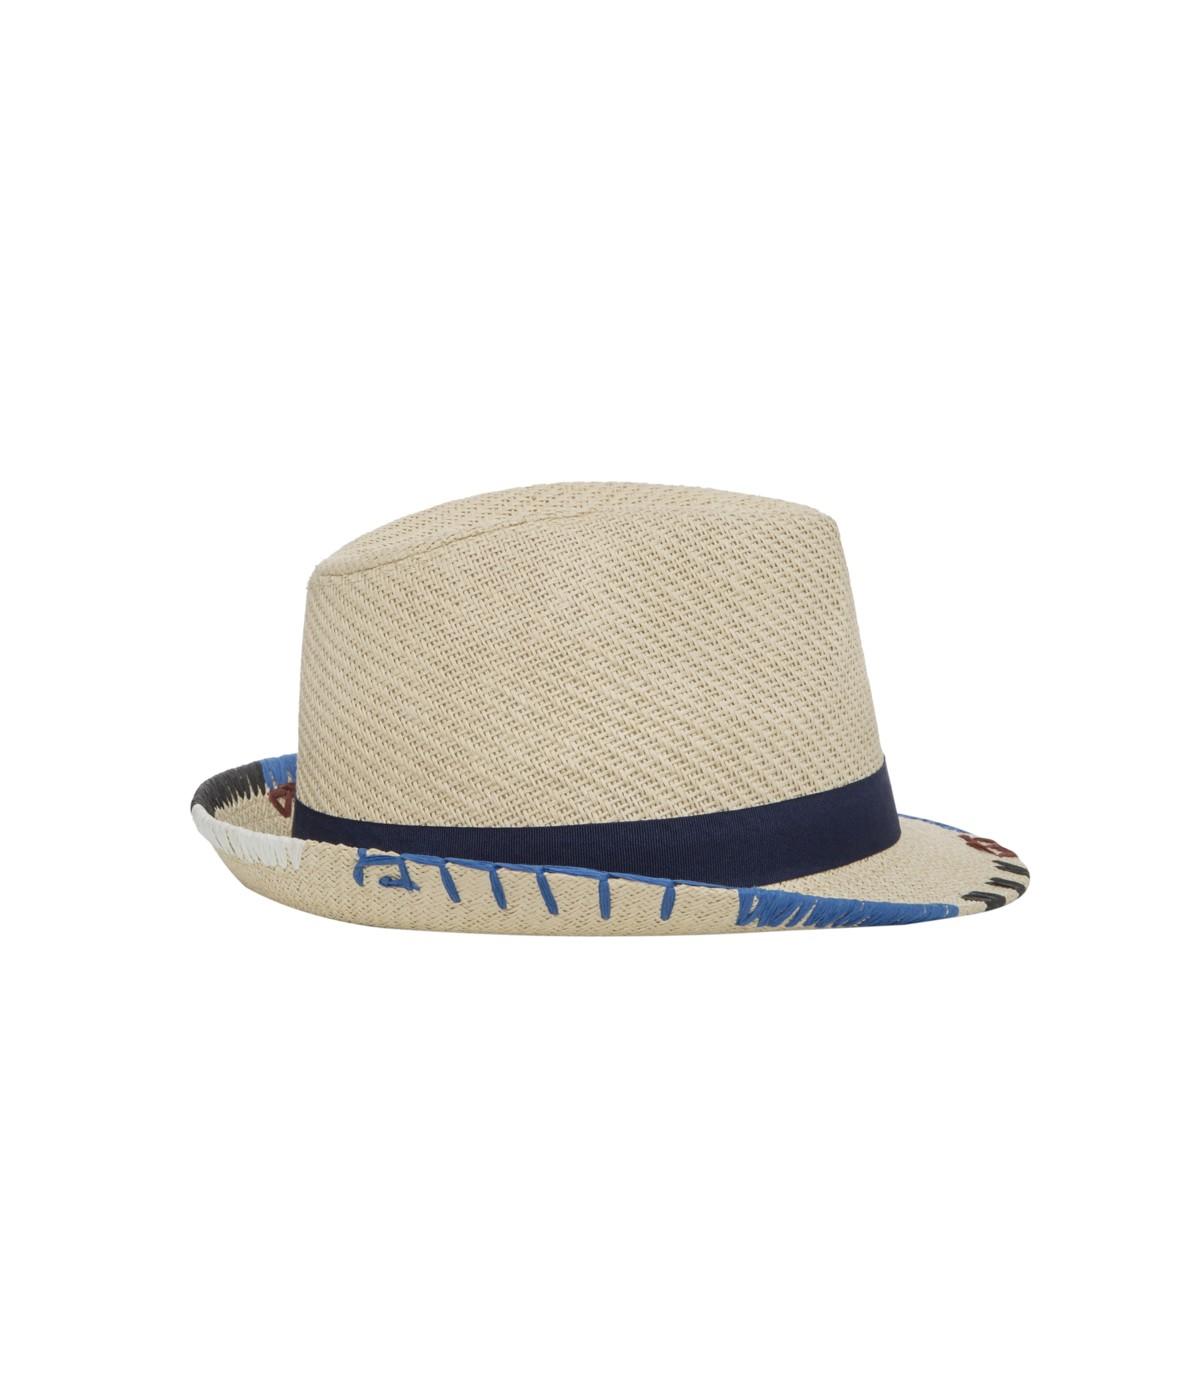 Stitch Hat